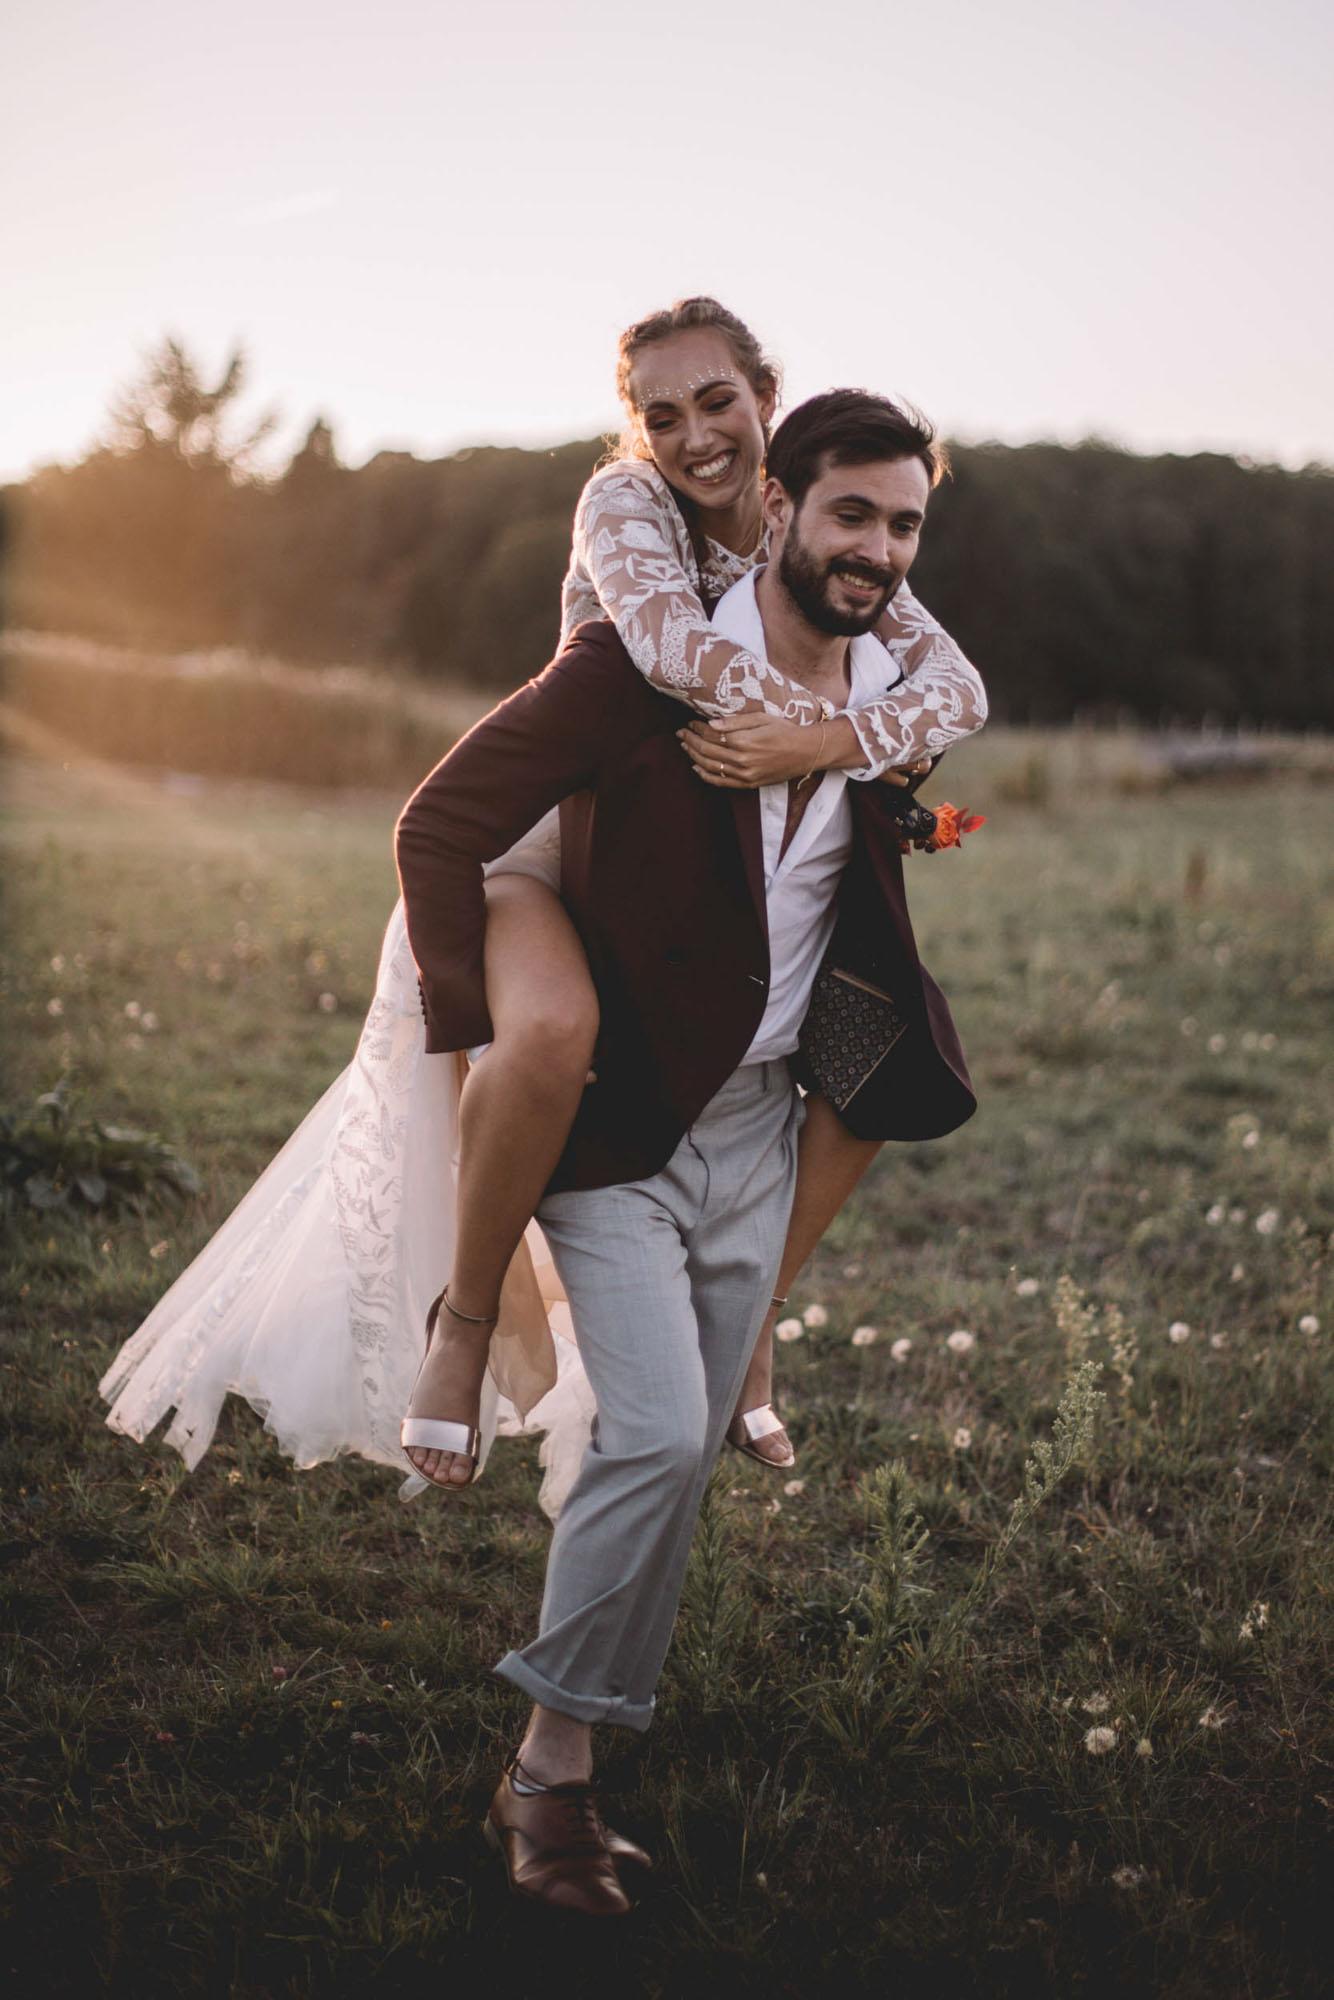 COACHELLA_LES BONNES JOIES_PHOTOGRAPHE_MARIAGE_LES BANDITS-12